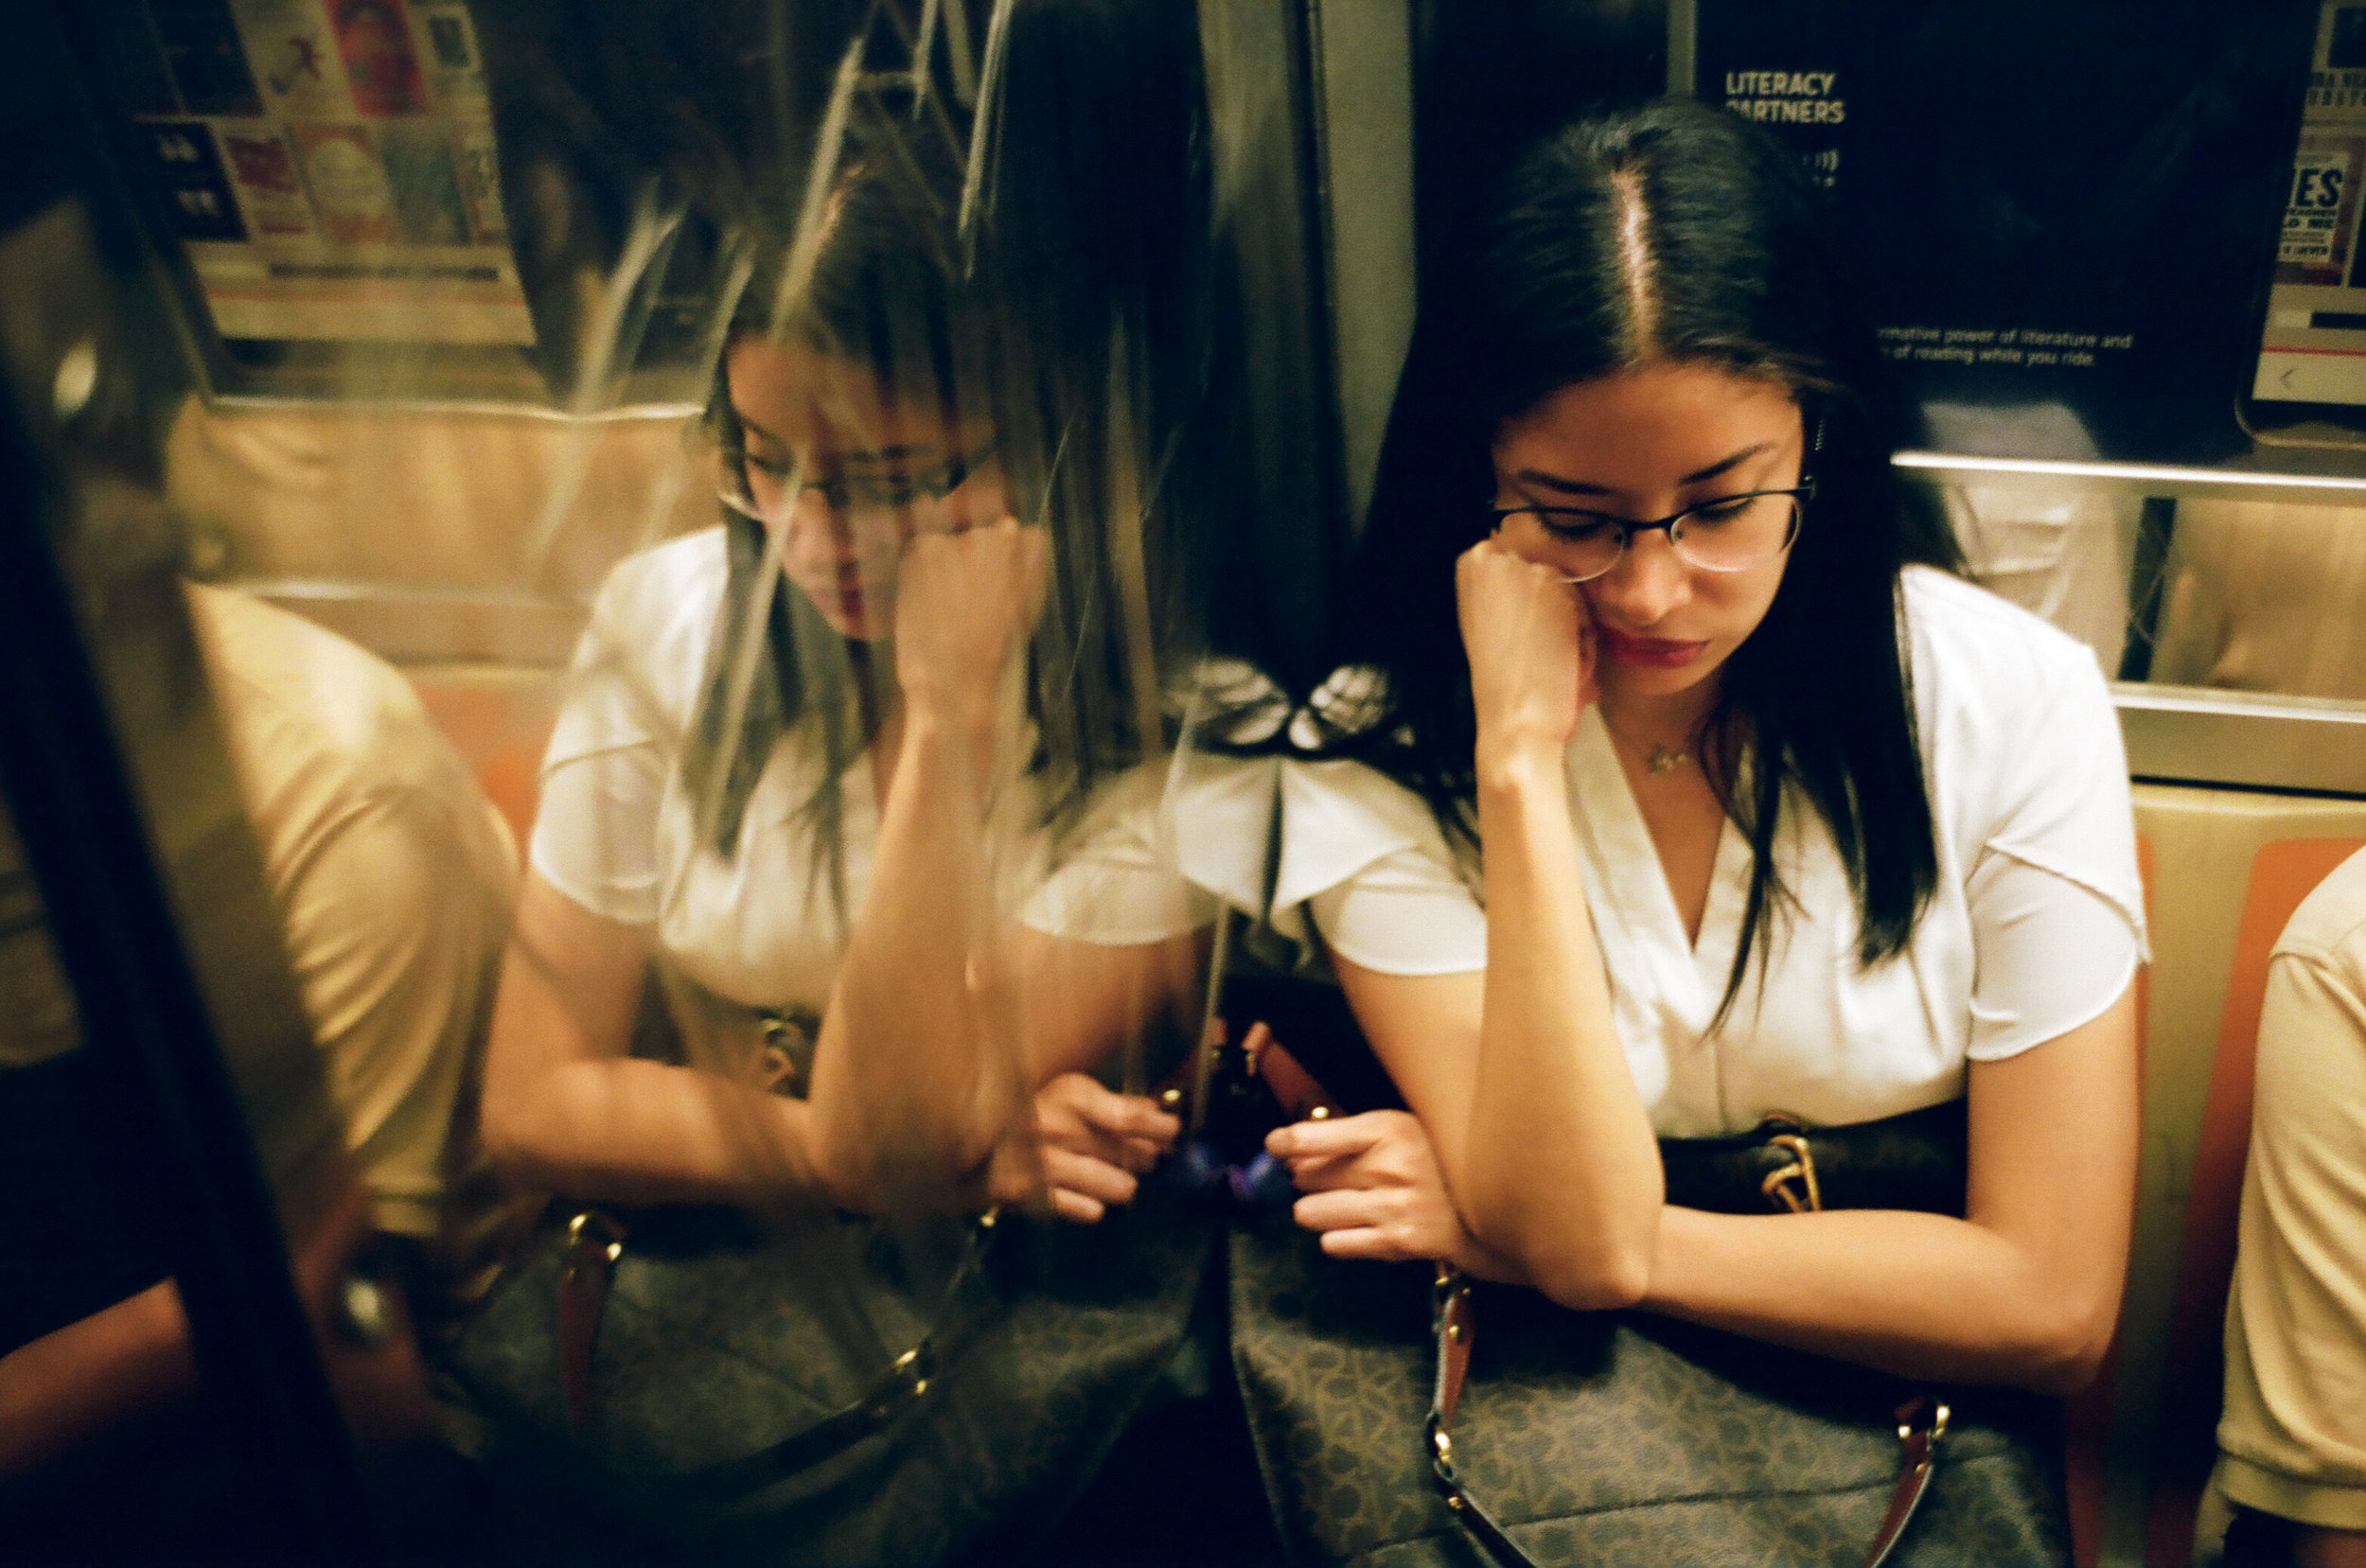 Woman Slepping in Subway.jpg